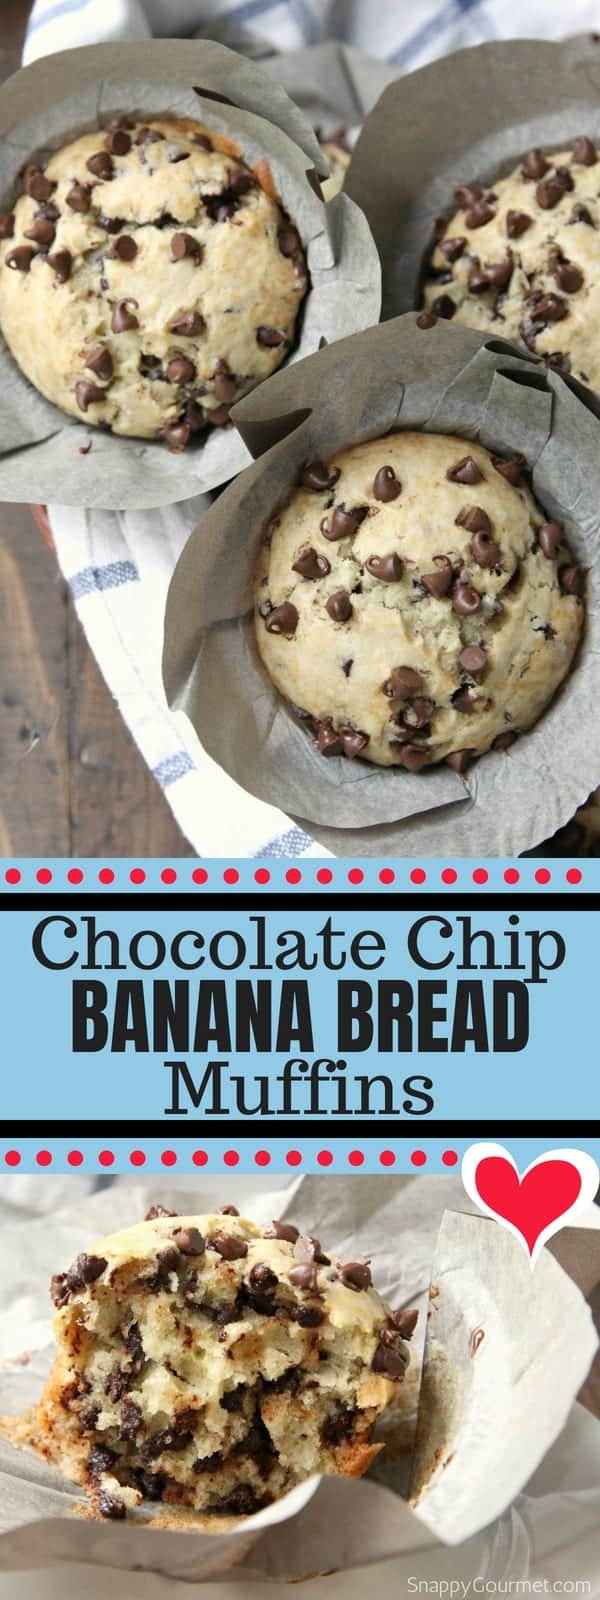 Chocolate Chip Banana Bread Muffins recipe - homemade banana muffins with chocolate chips